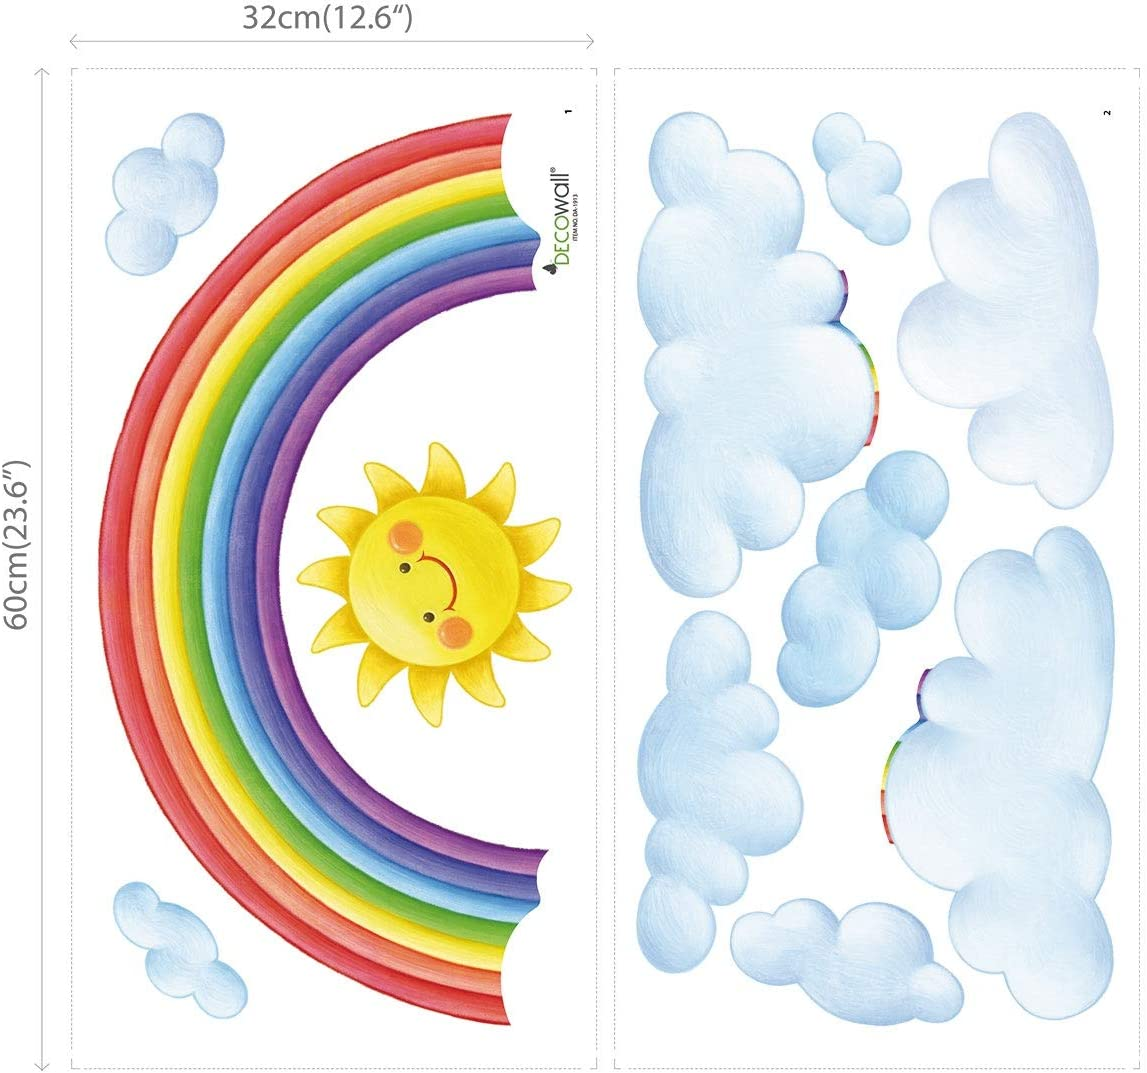 DecowallRainbow and Hot Air Balloons Nursery Wall Stickers DA-1913P1406B